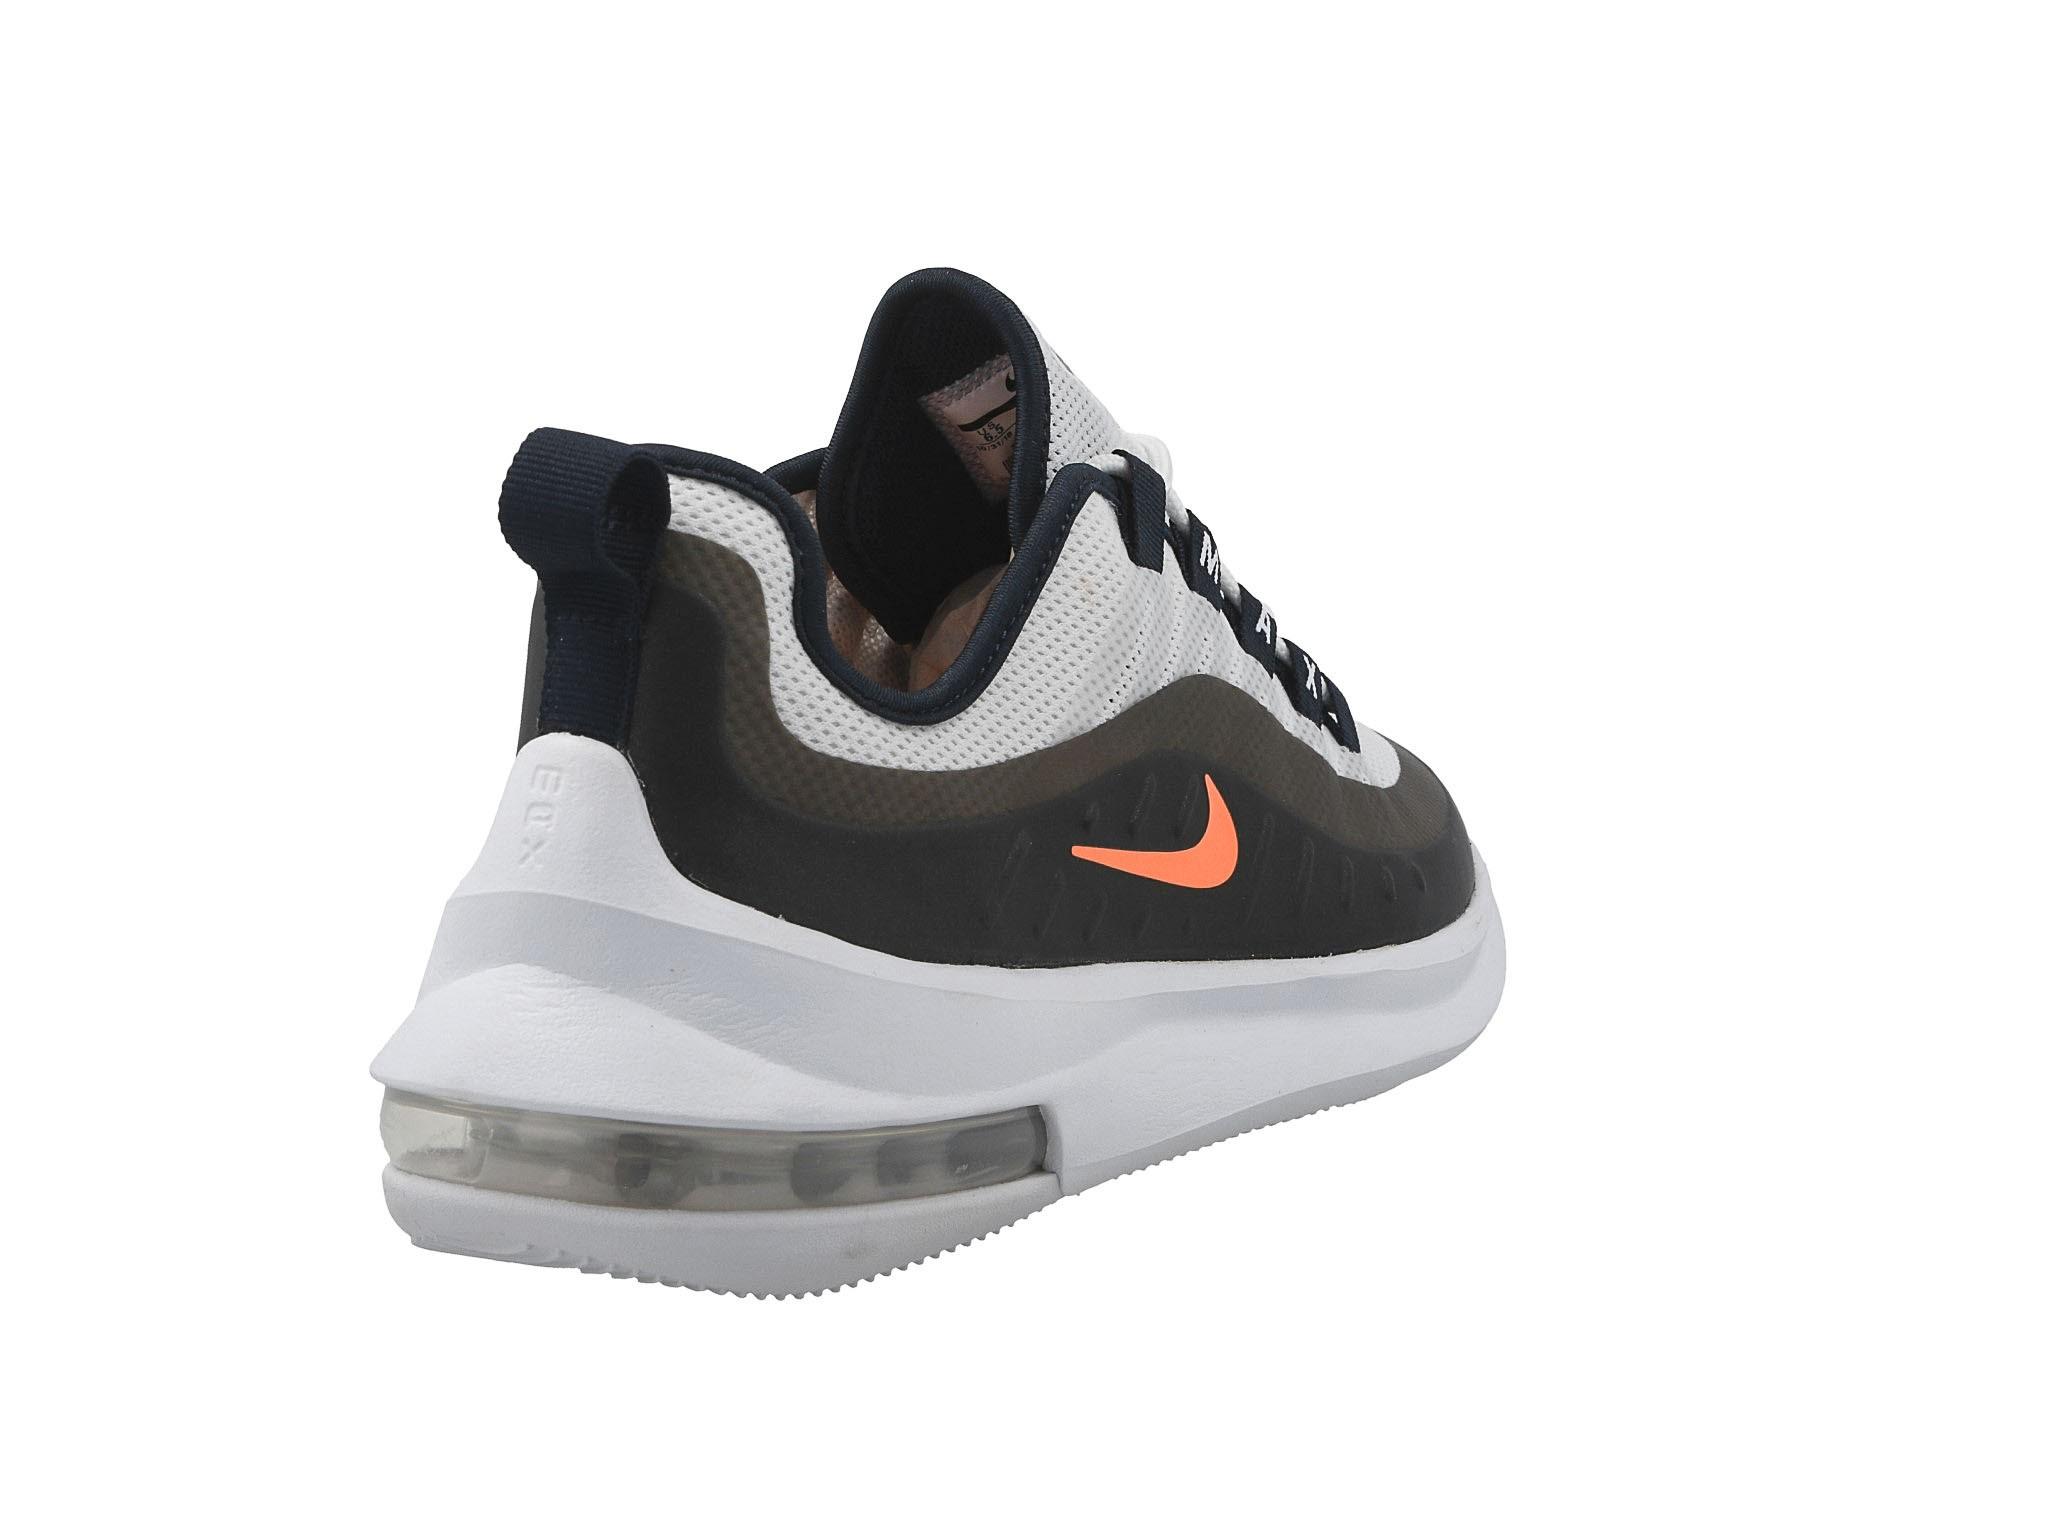 Schuhe NIKE Air Max Axis AA2146 108 WhiteTotal OrangeObsidian